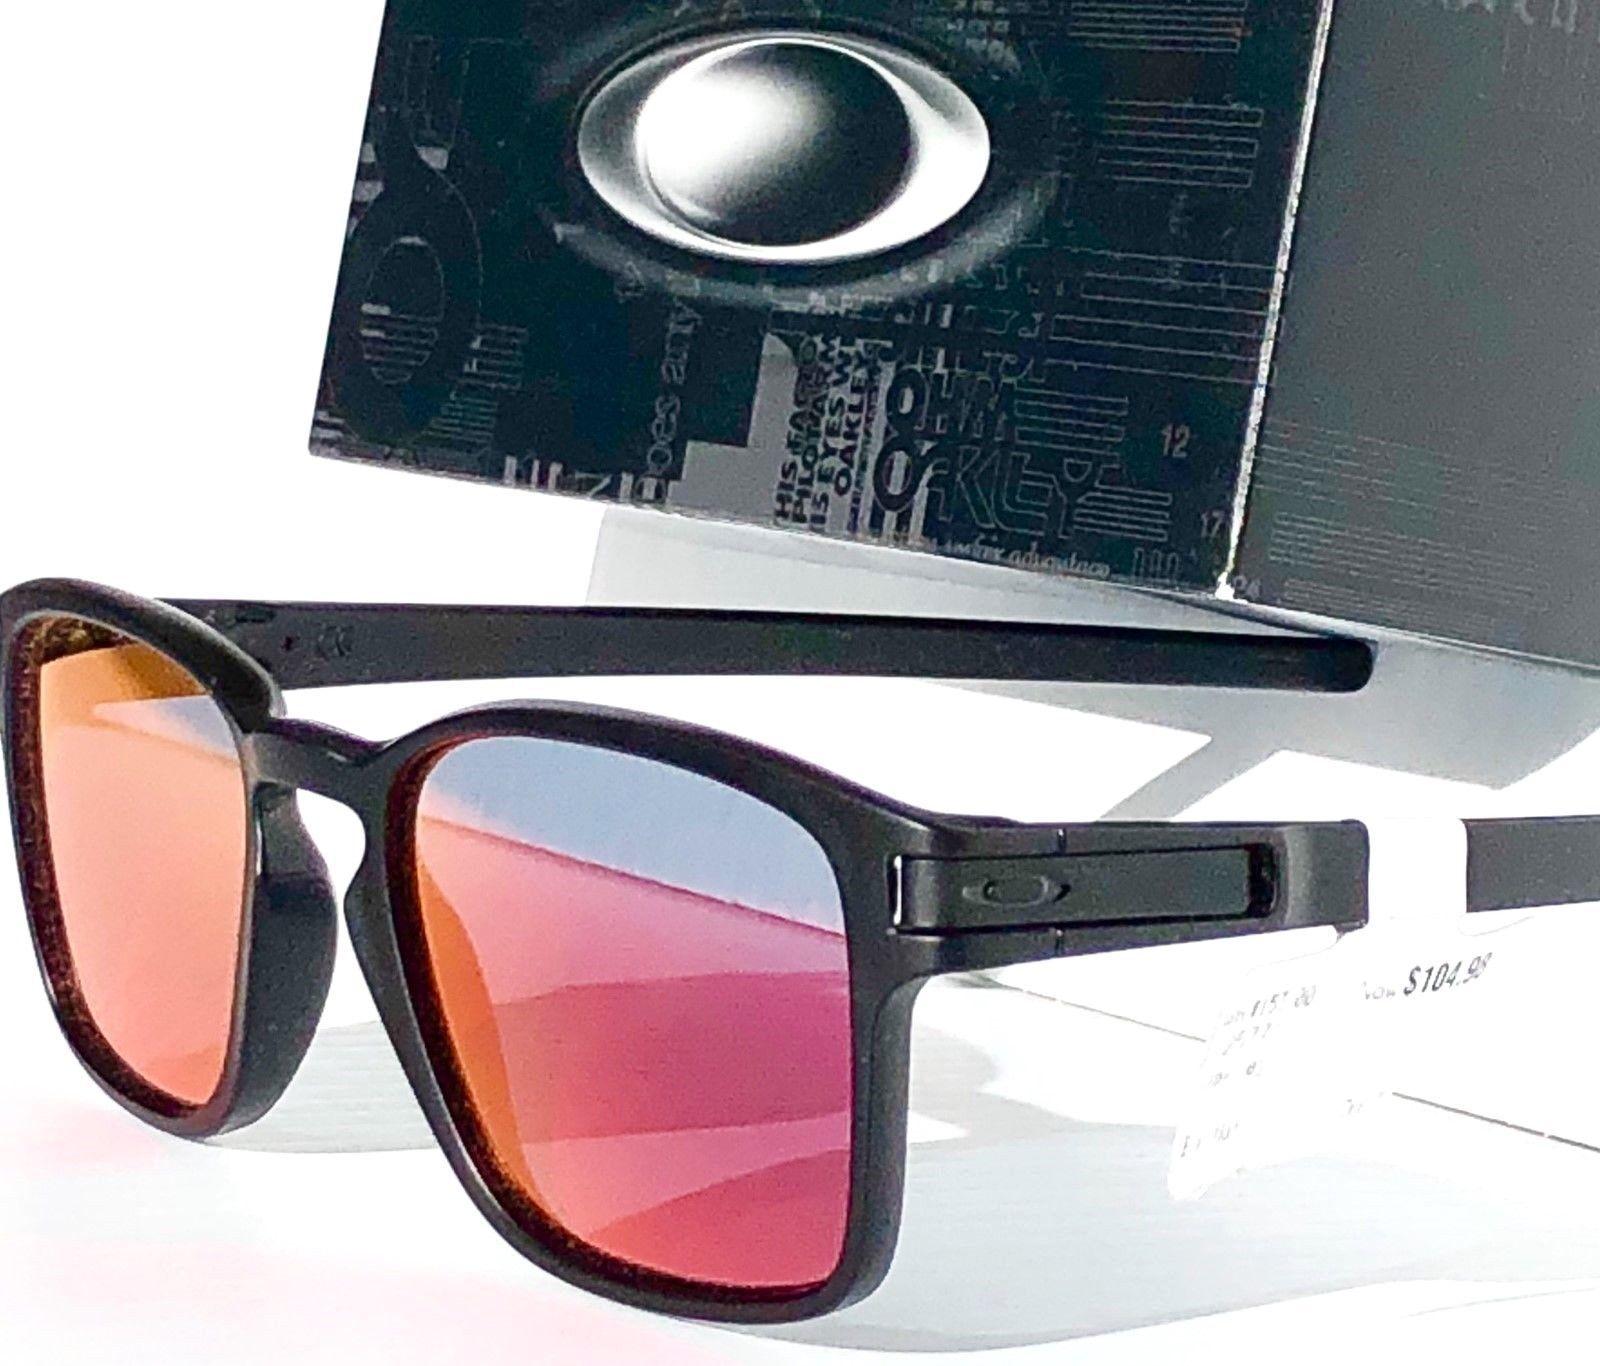 0b9455eccc NEW Oakley LATCH SQ Matte BLACK w TORCH Iridium lens Sunglass oo9358 ...